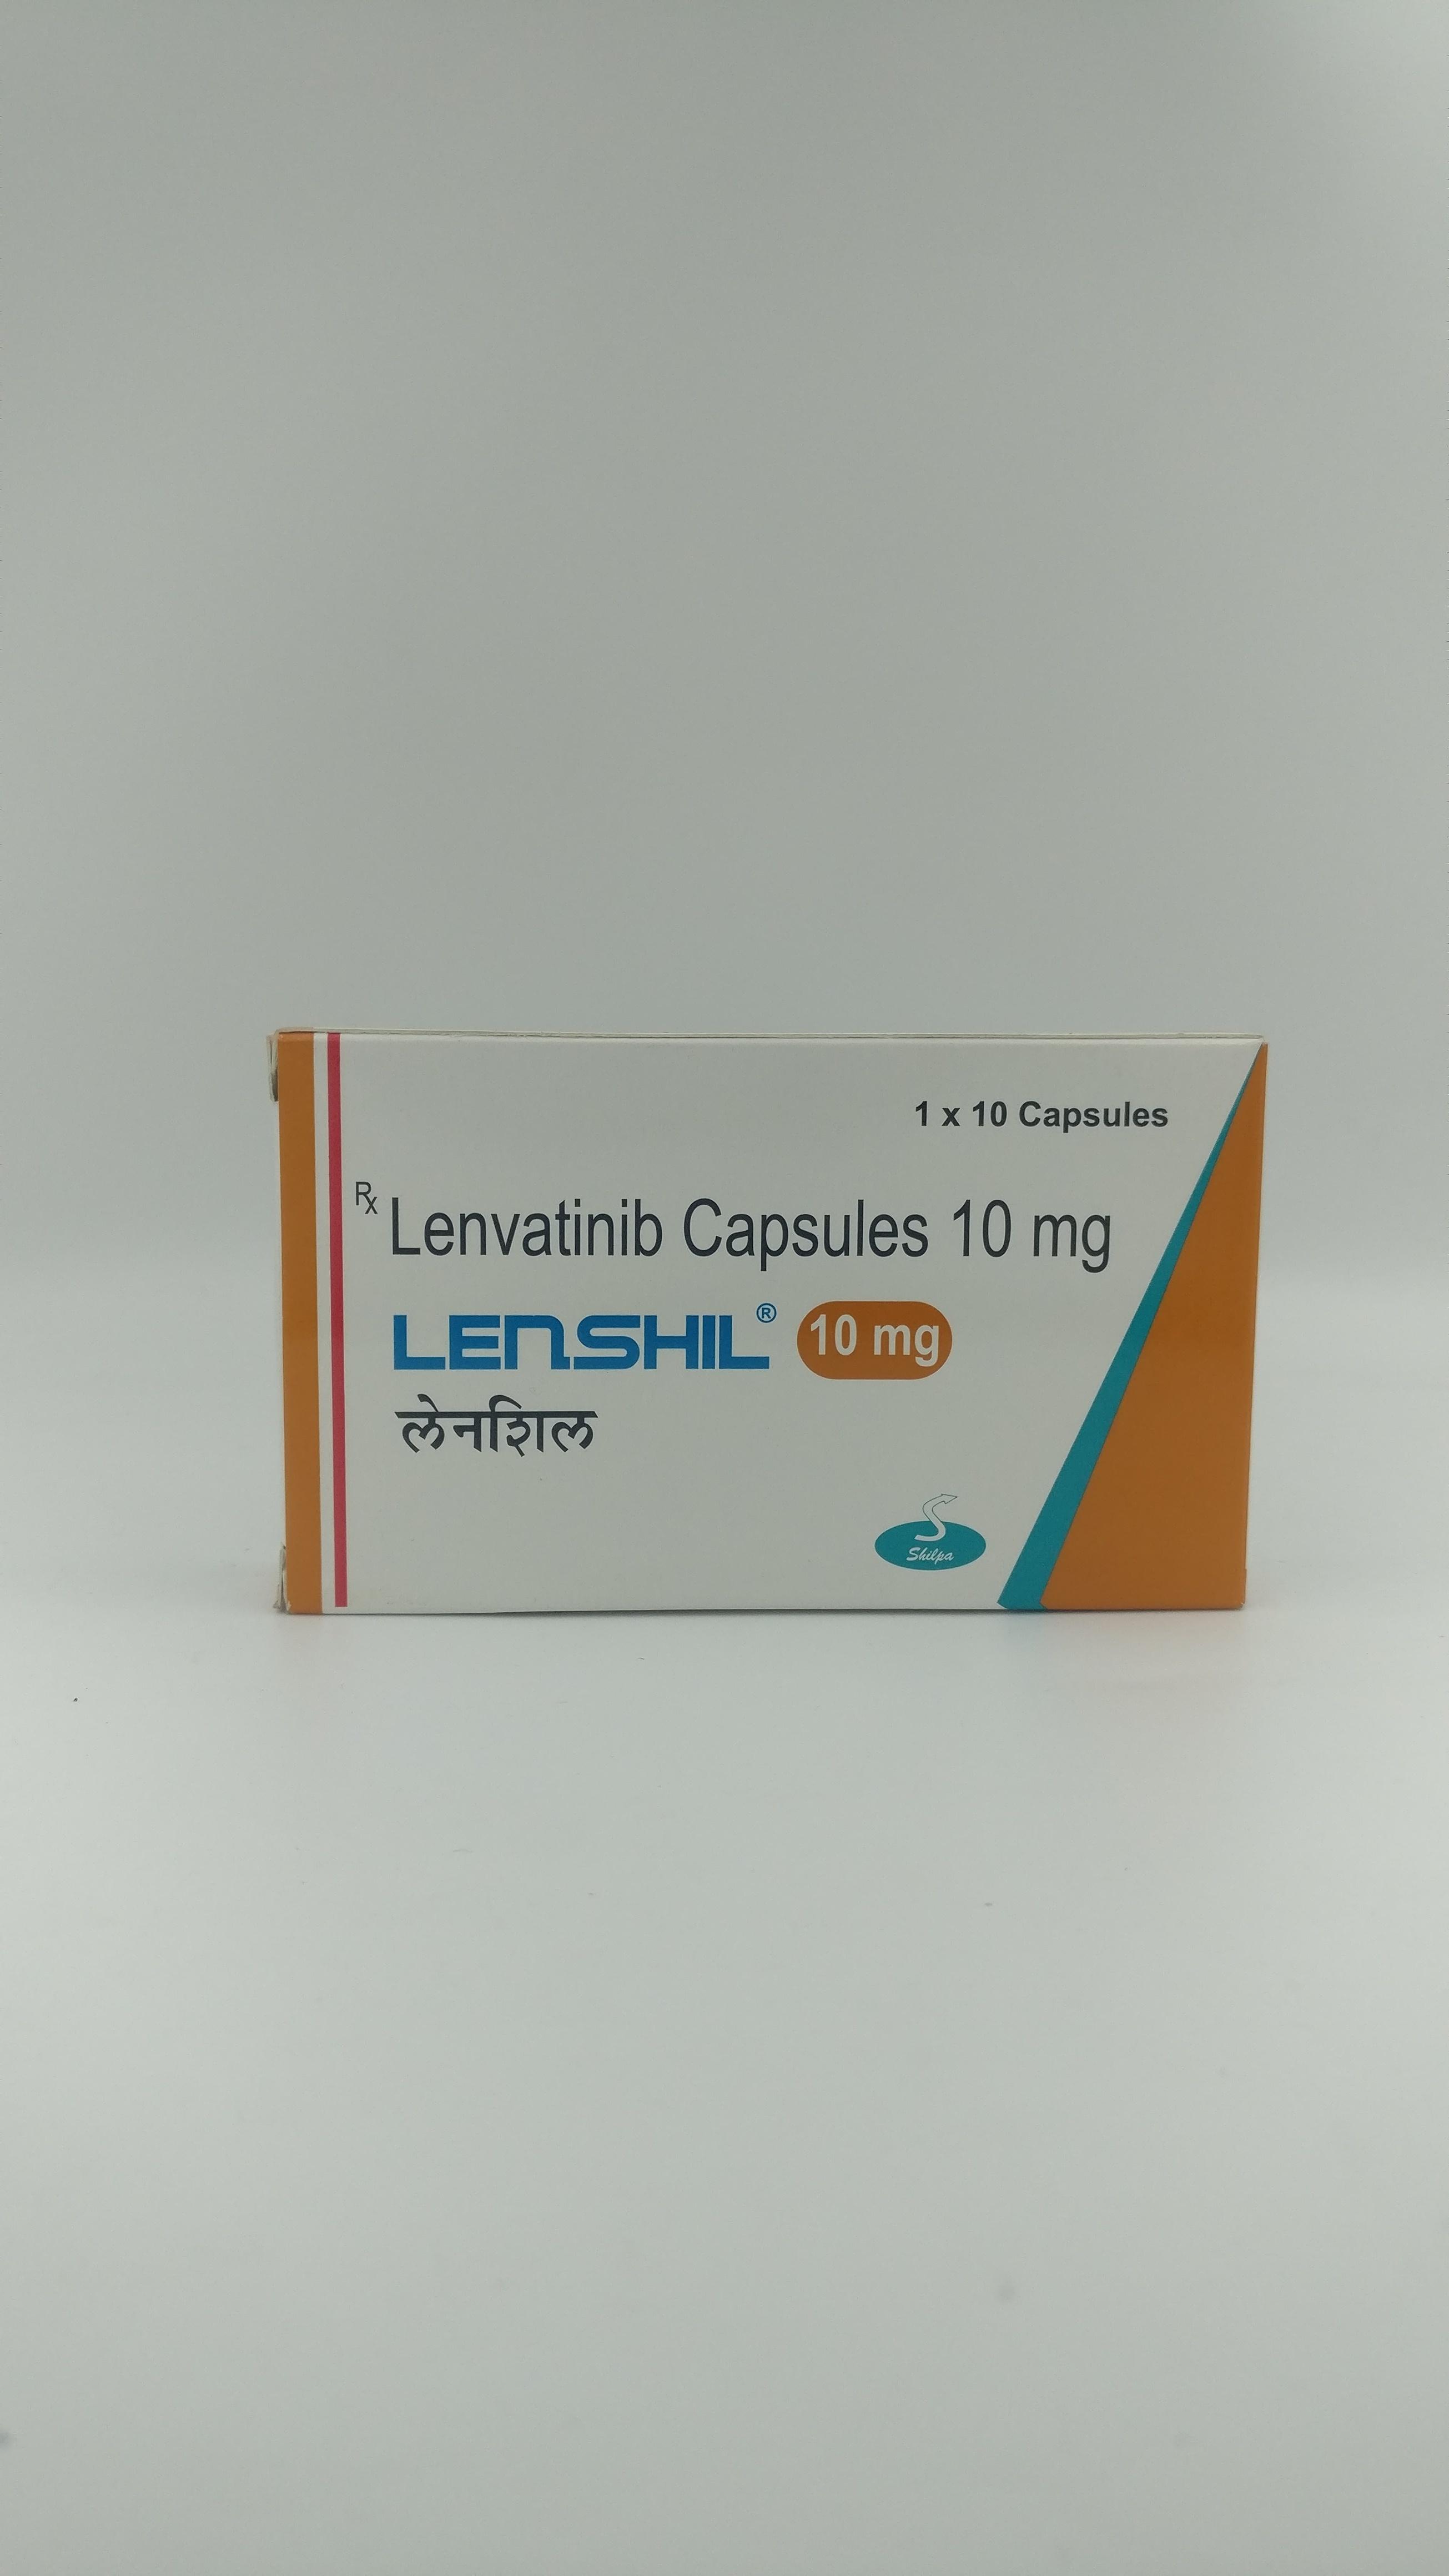 Lenshil 10 mg Capsule (Lenvatinib (10mg))